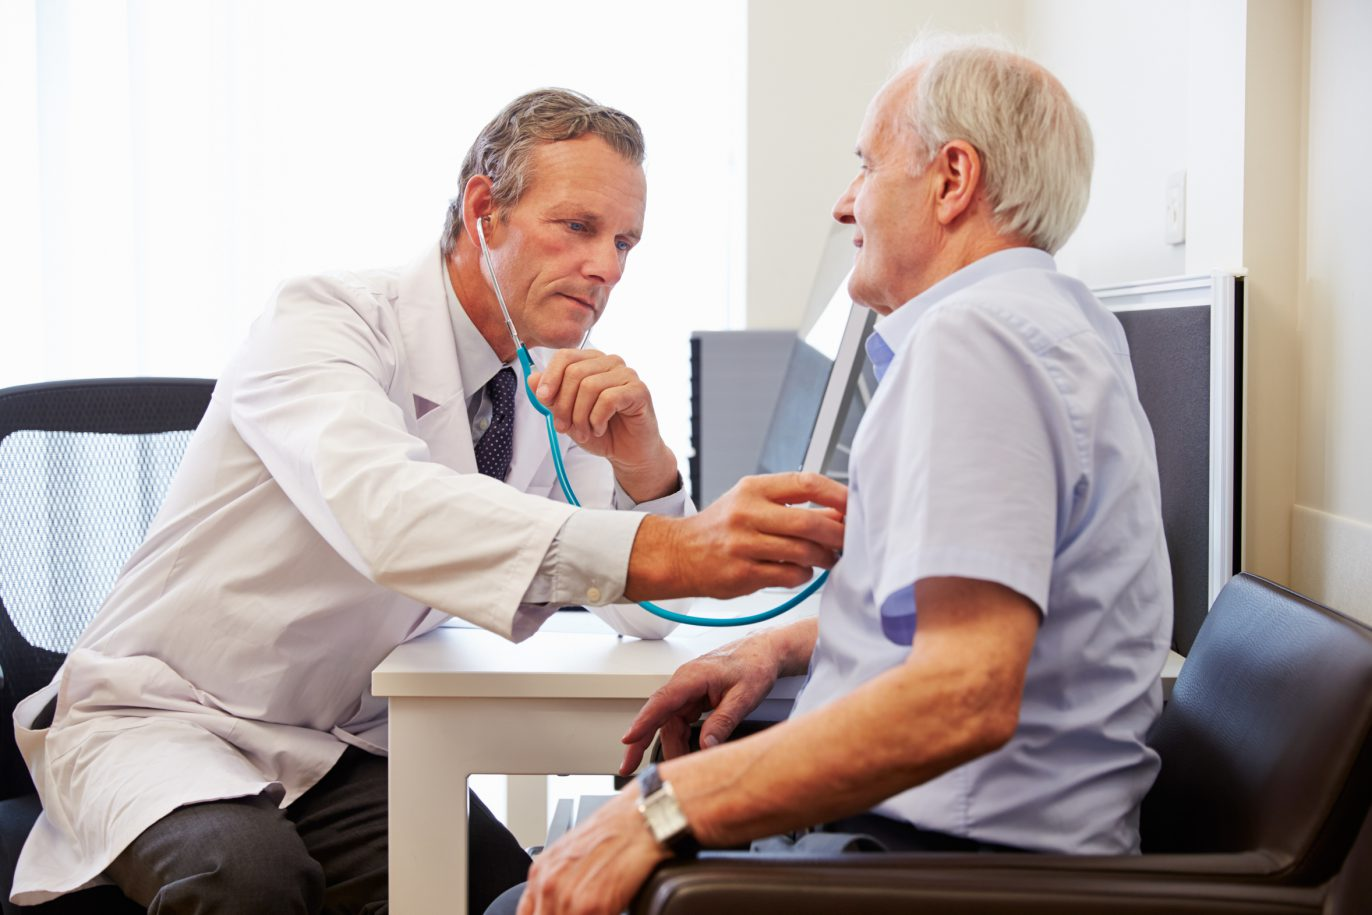 Arzt untersucht älteren Patient.